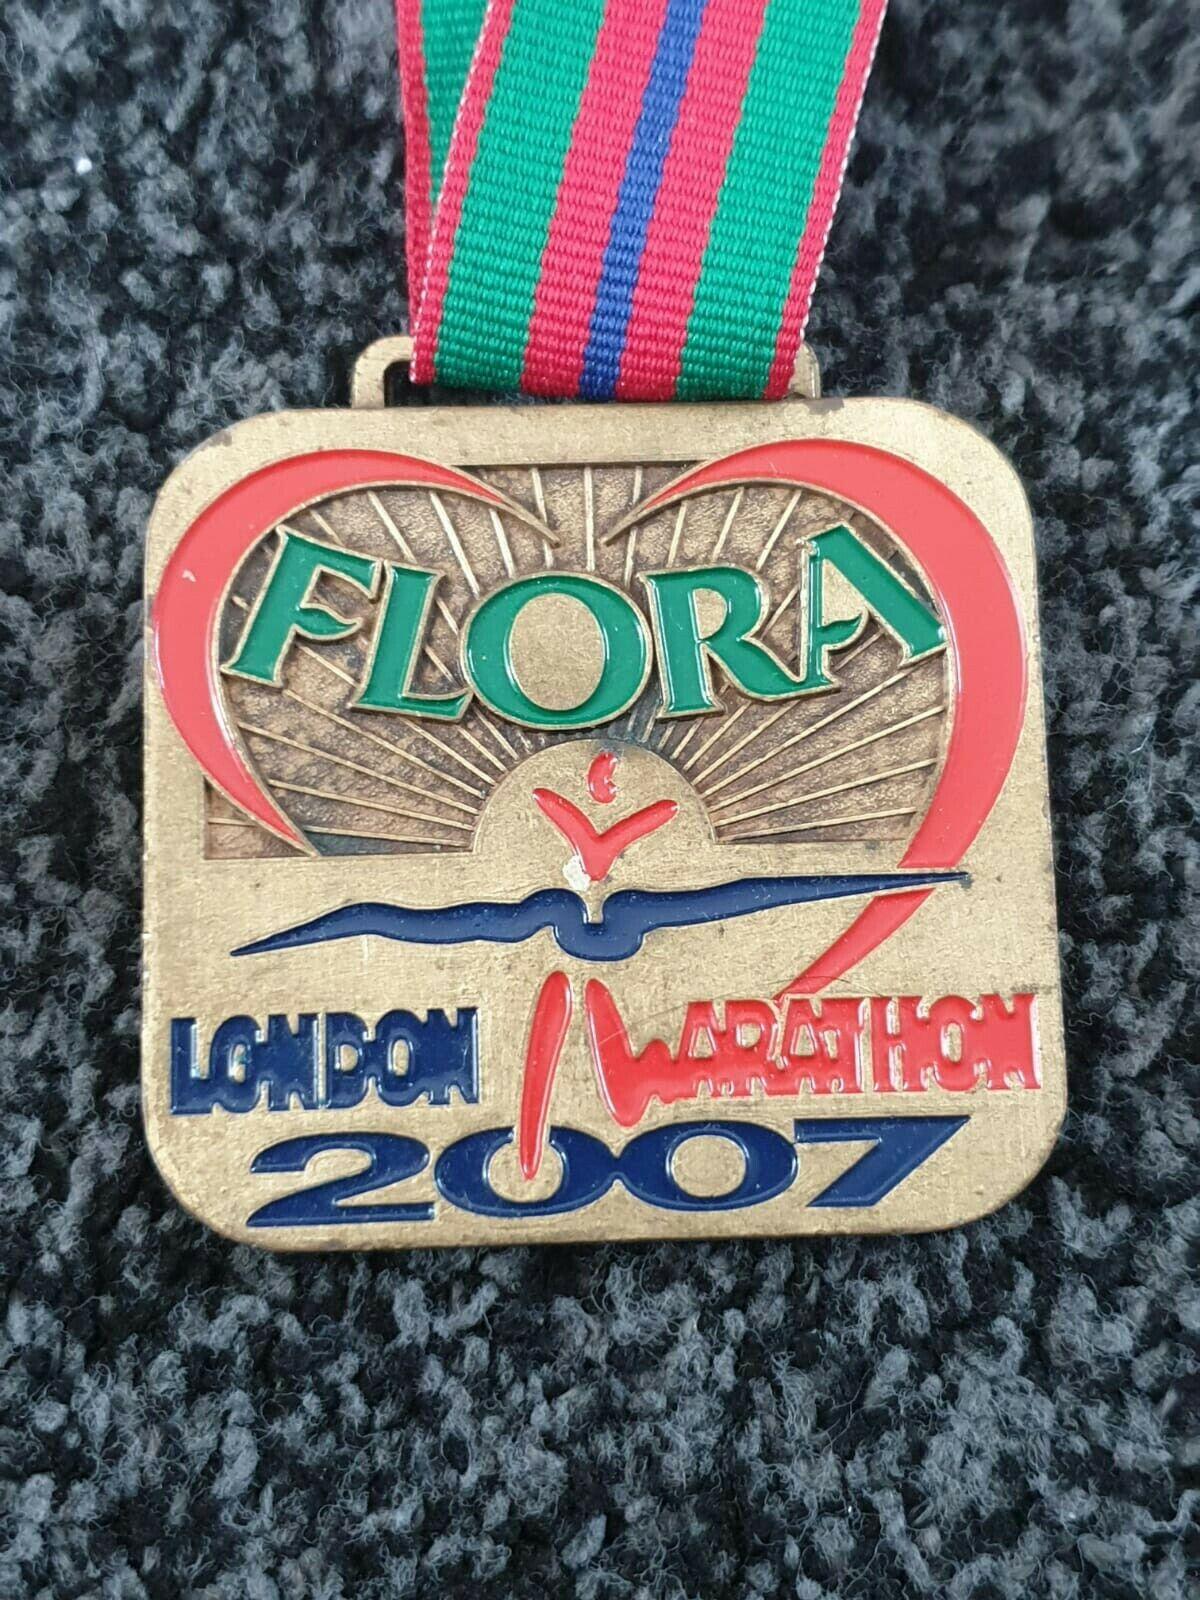 Flora London Marathon 2007 Finishers médaille